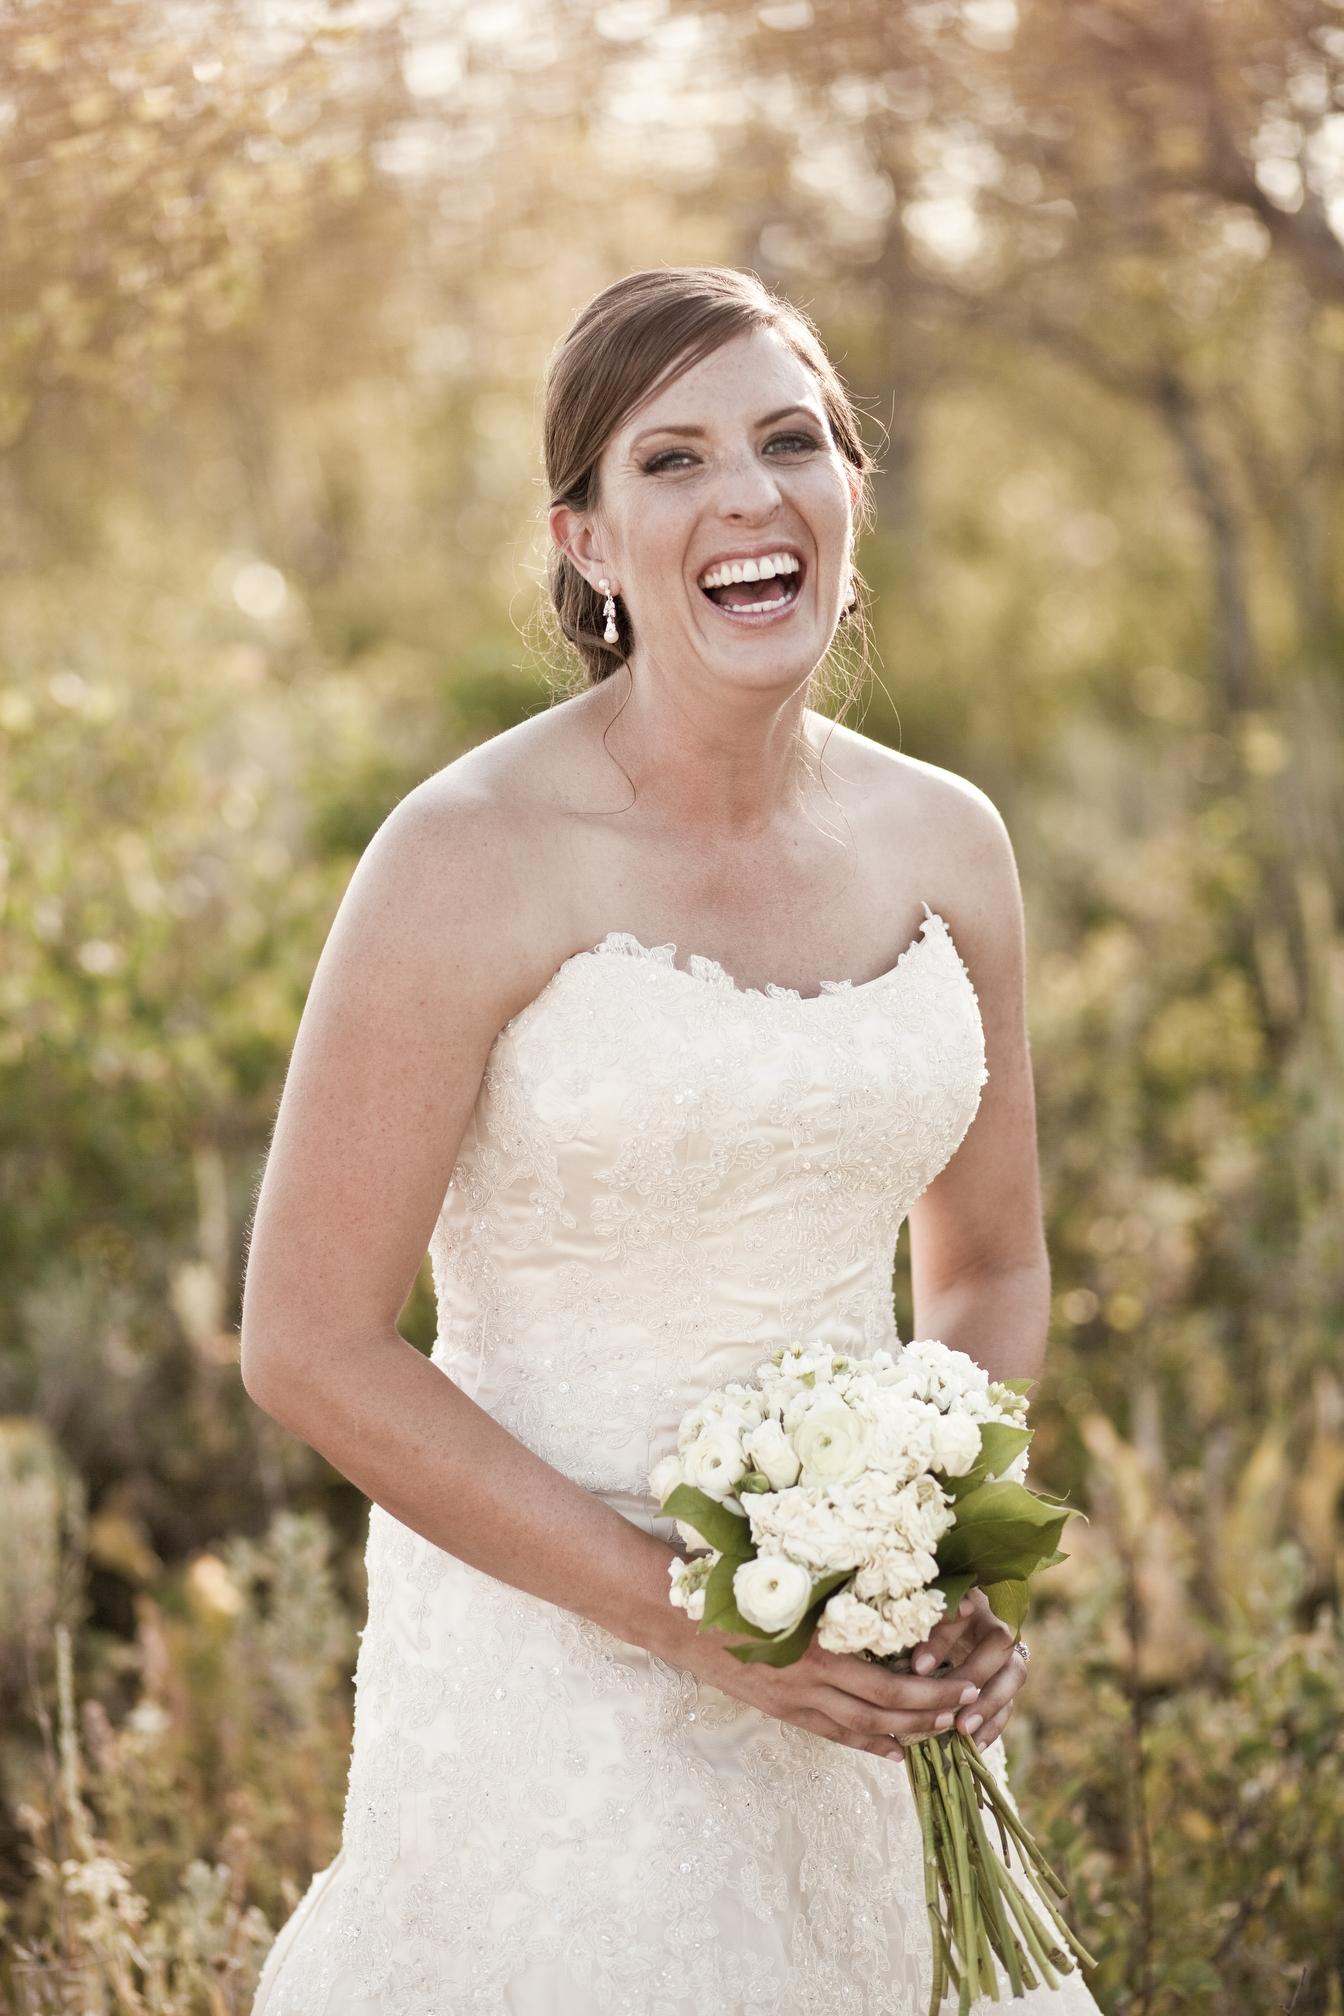 Duer Jackson Hole Wedding 2012_1443.JPG